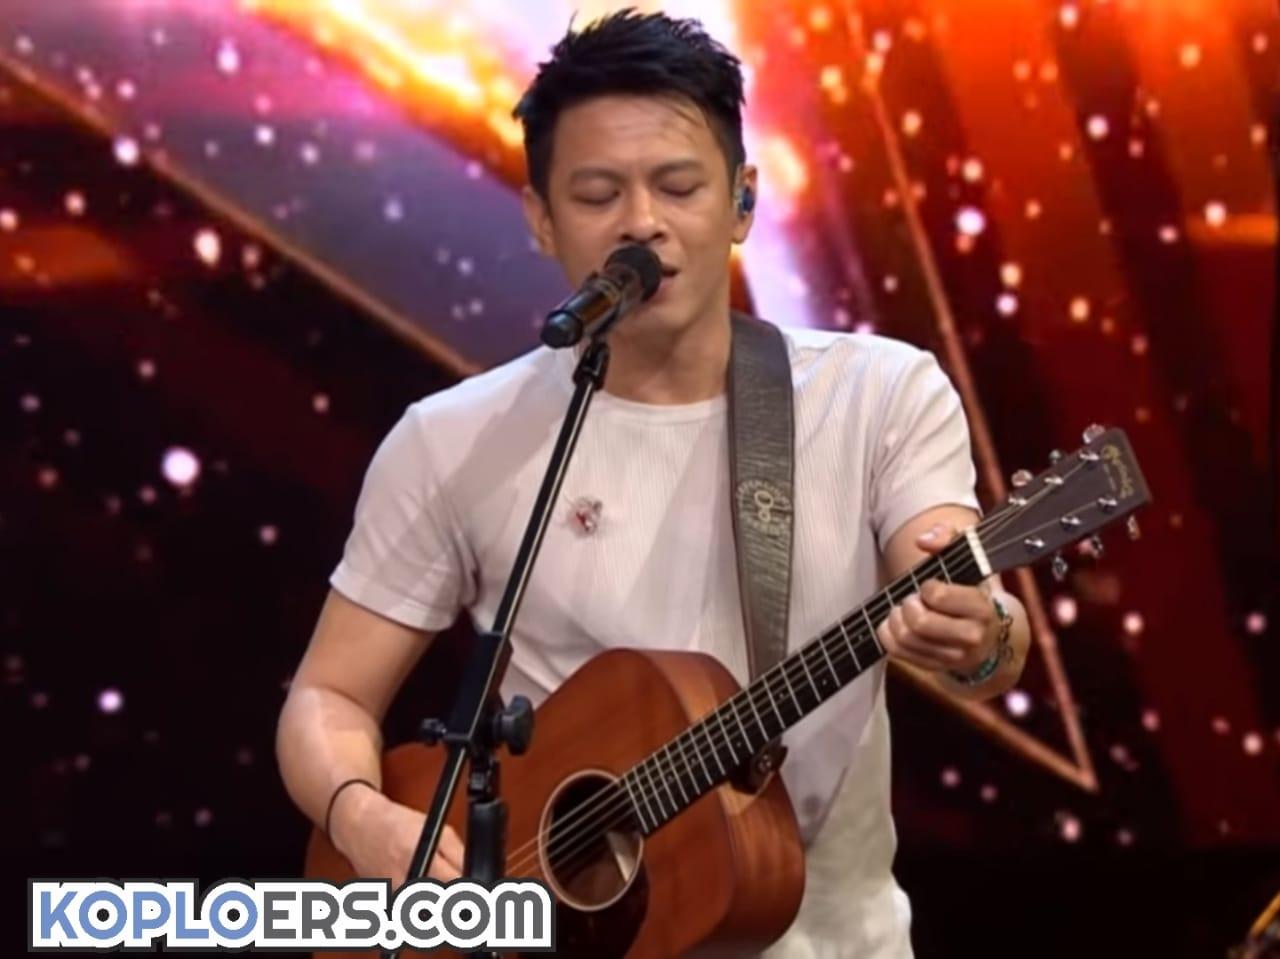 Download Kumpulan Lagu Noah & Peterpan Full Album Terlengkap 2019